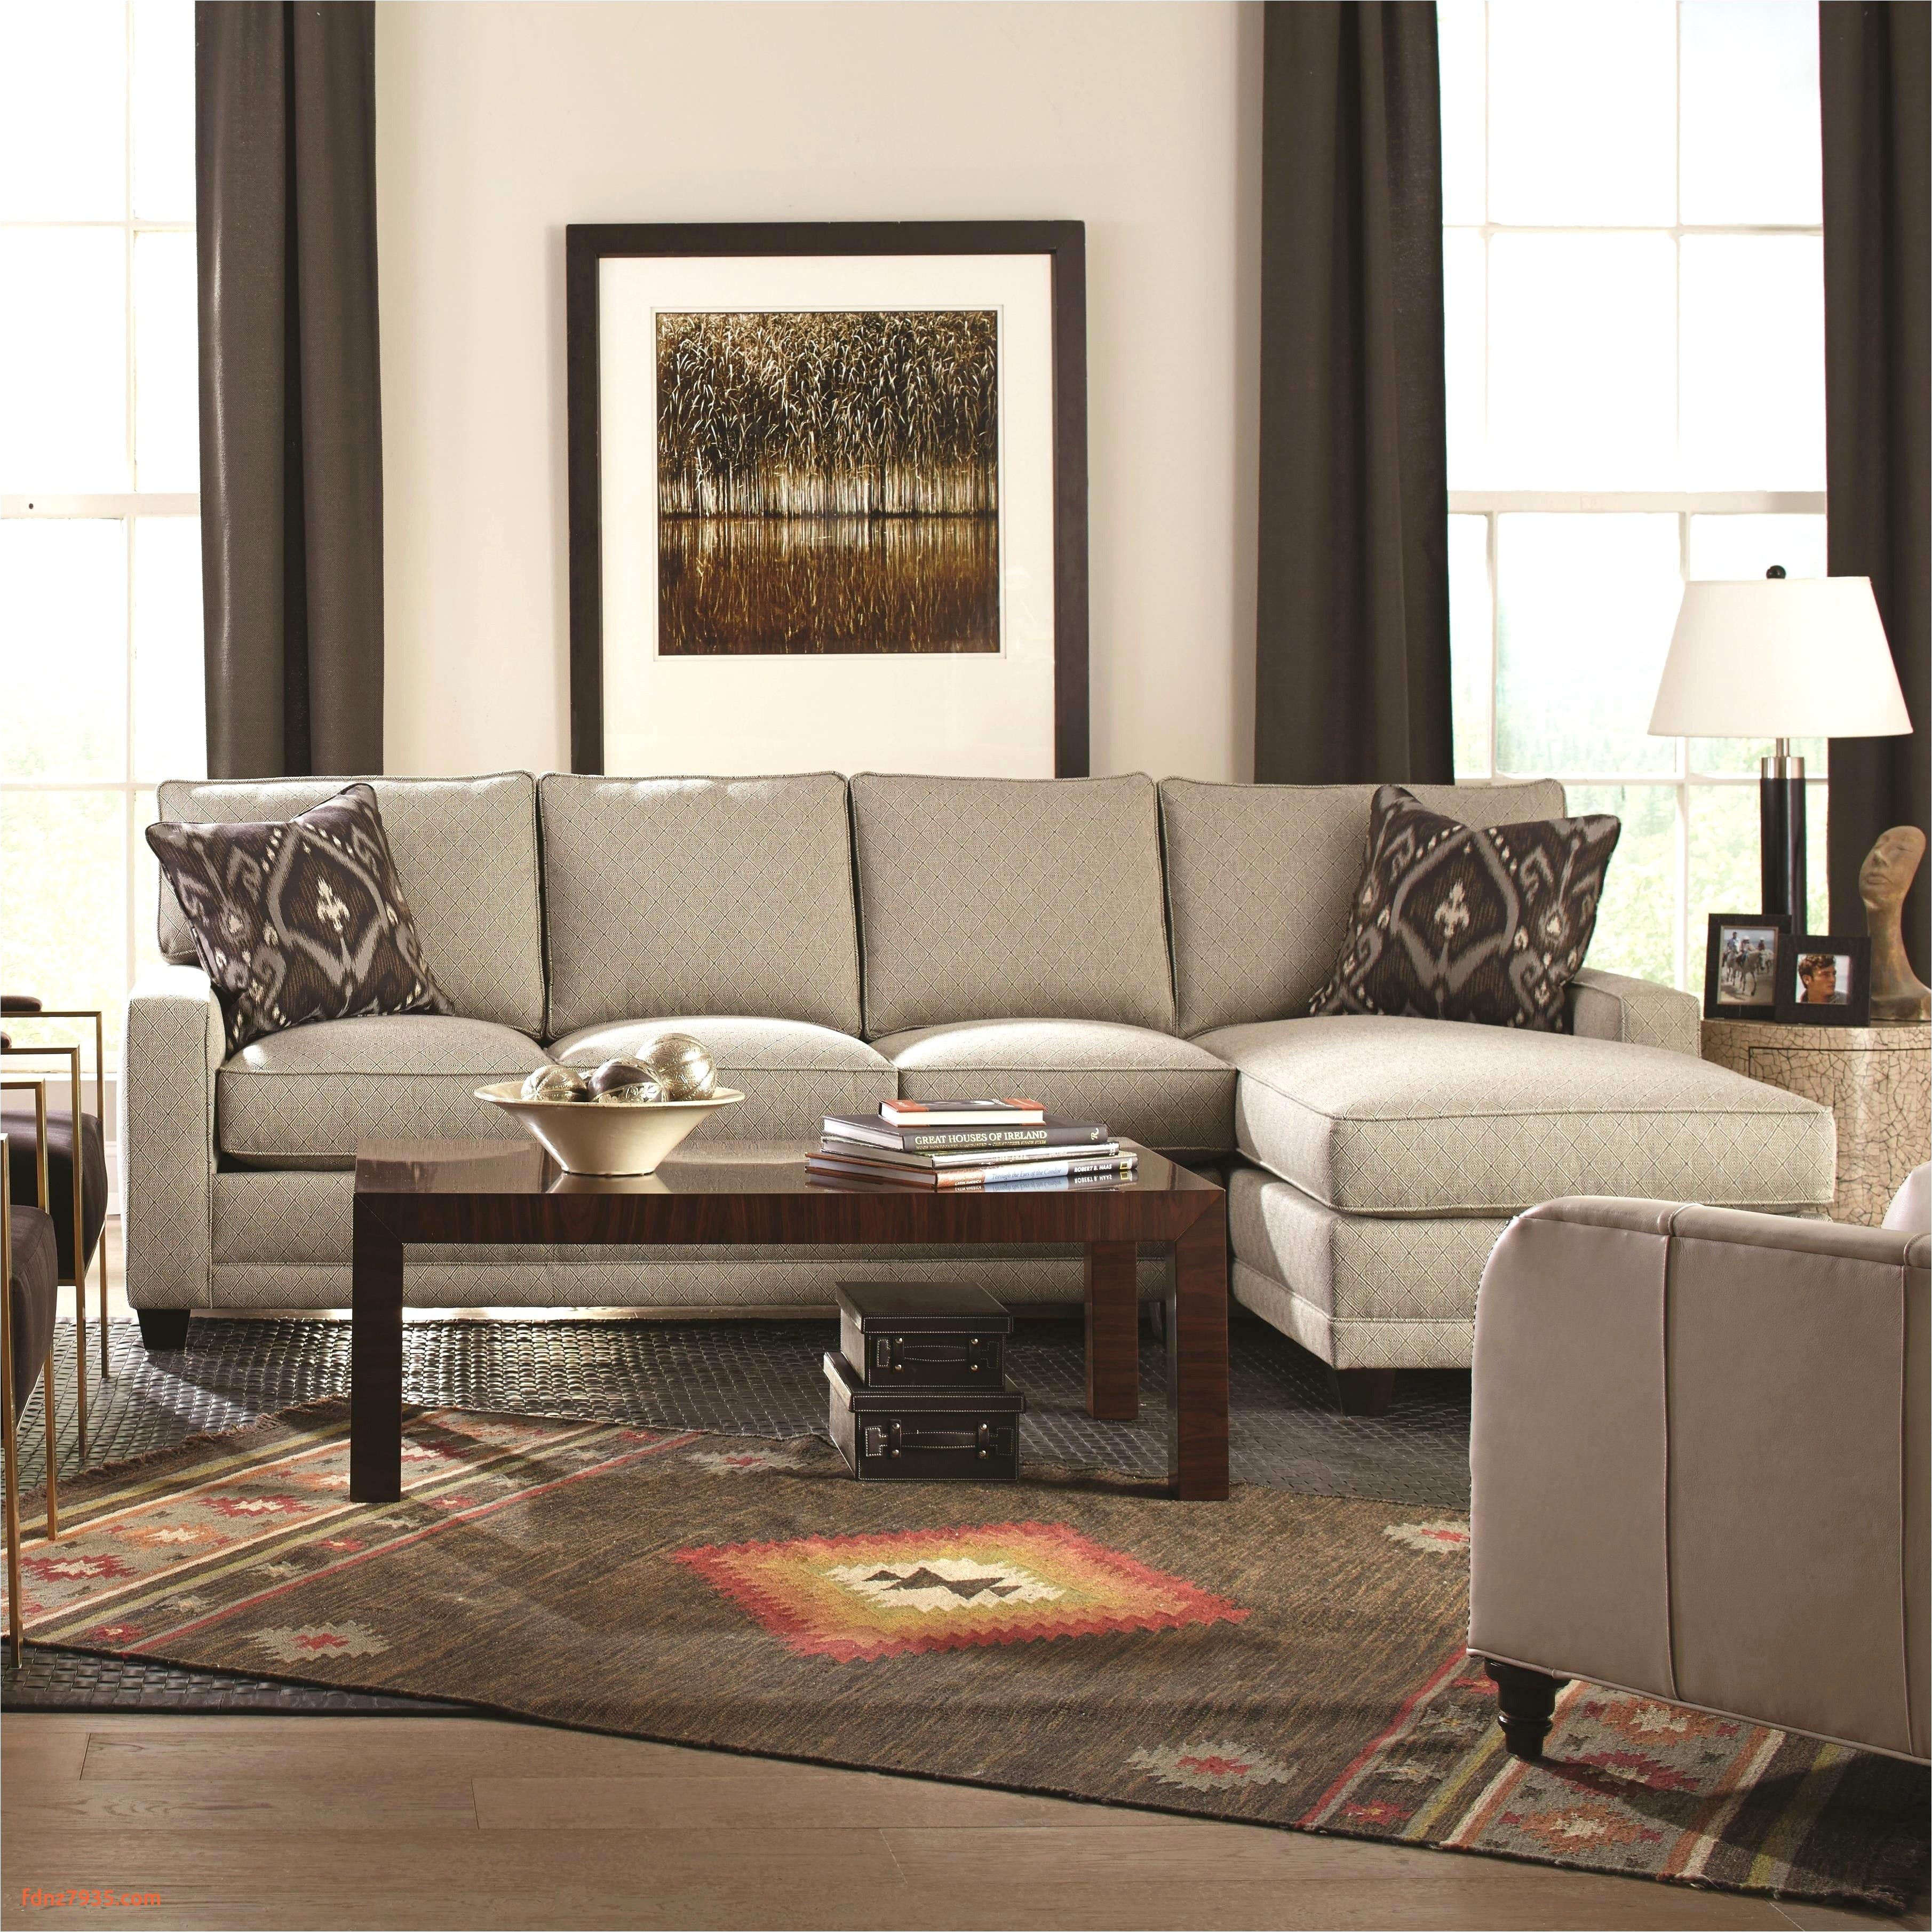 modern sofa table design awesome modern sofa set unique sofa big gunstige sofa macys furniture 0d